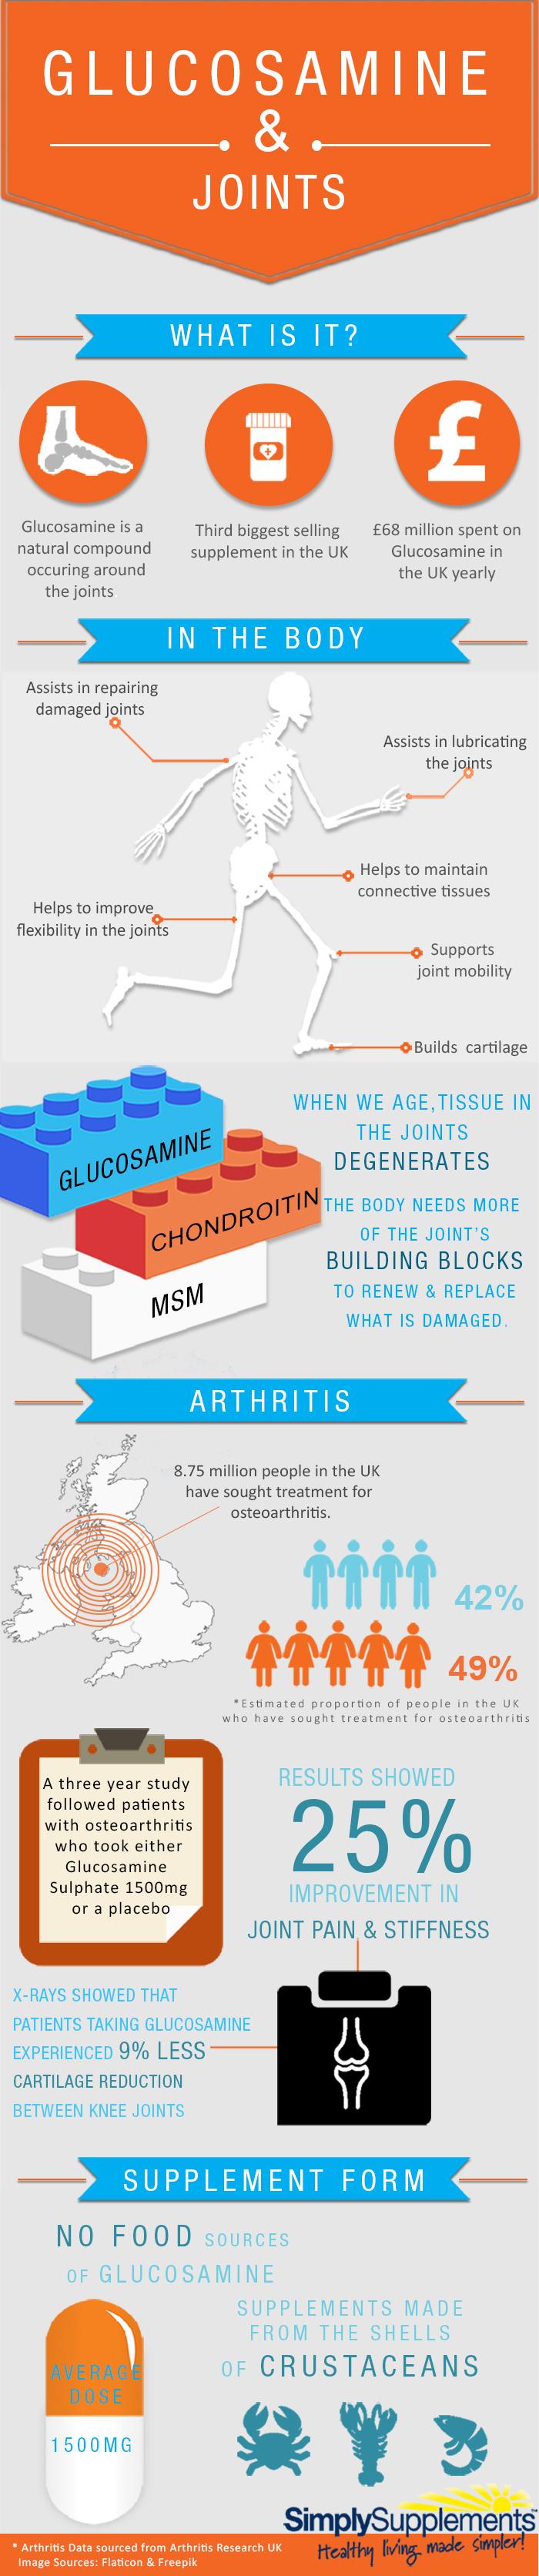 Glucosamine & Joints